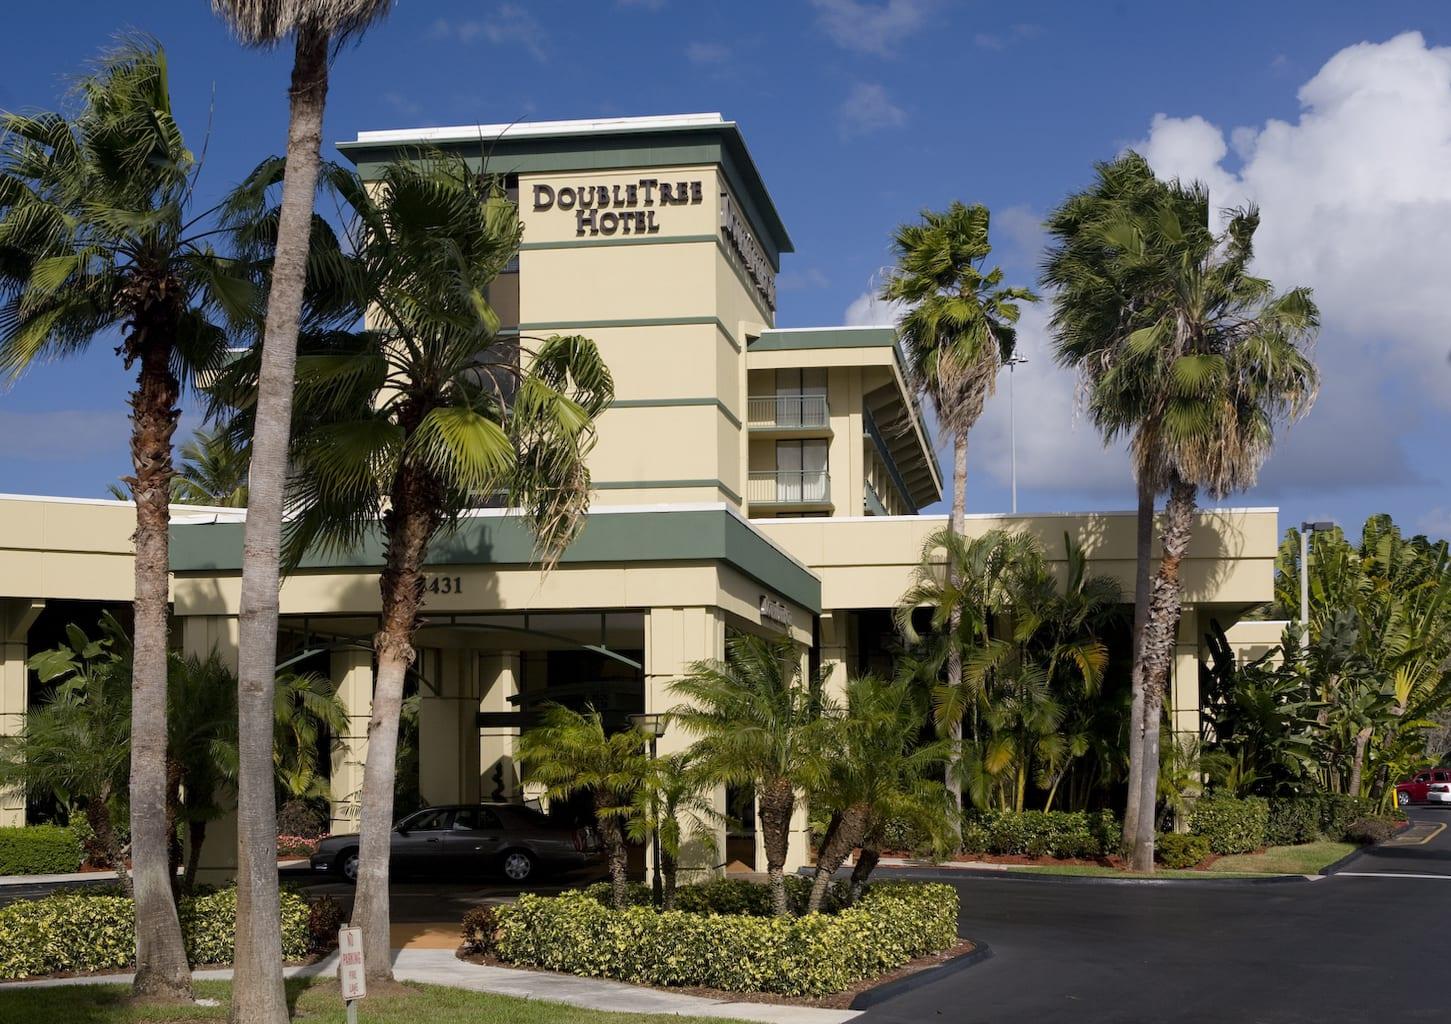 DoubleTree Hotel Entrance